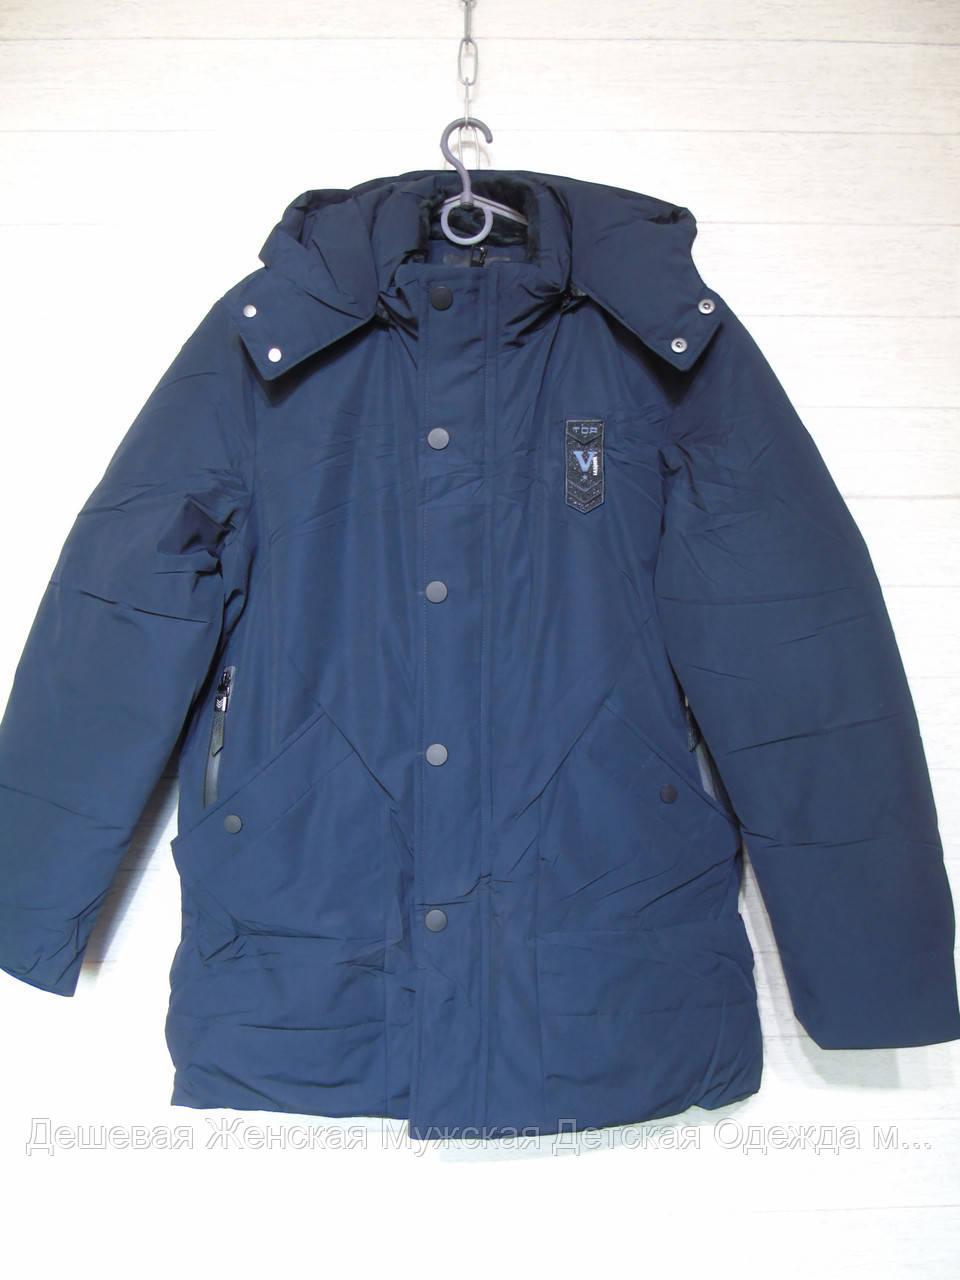 Куртка чоловіча ботал зима